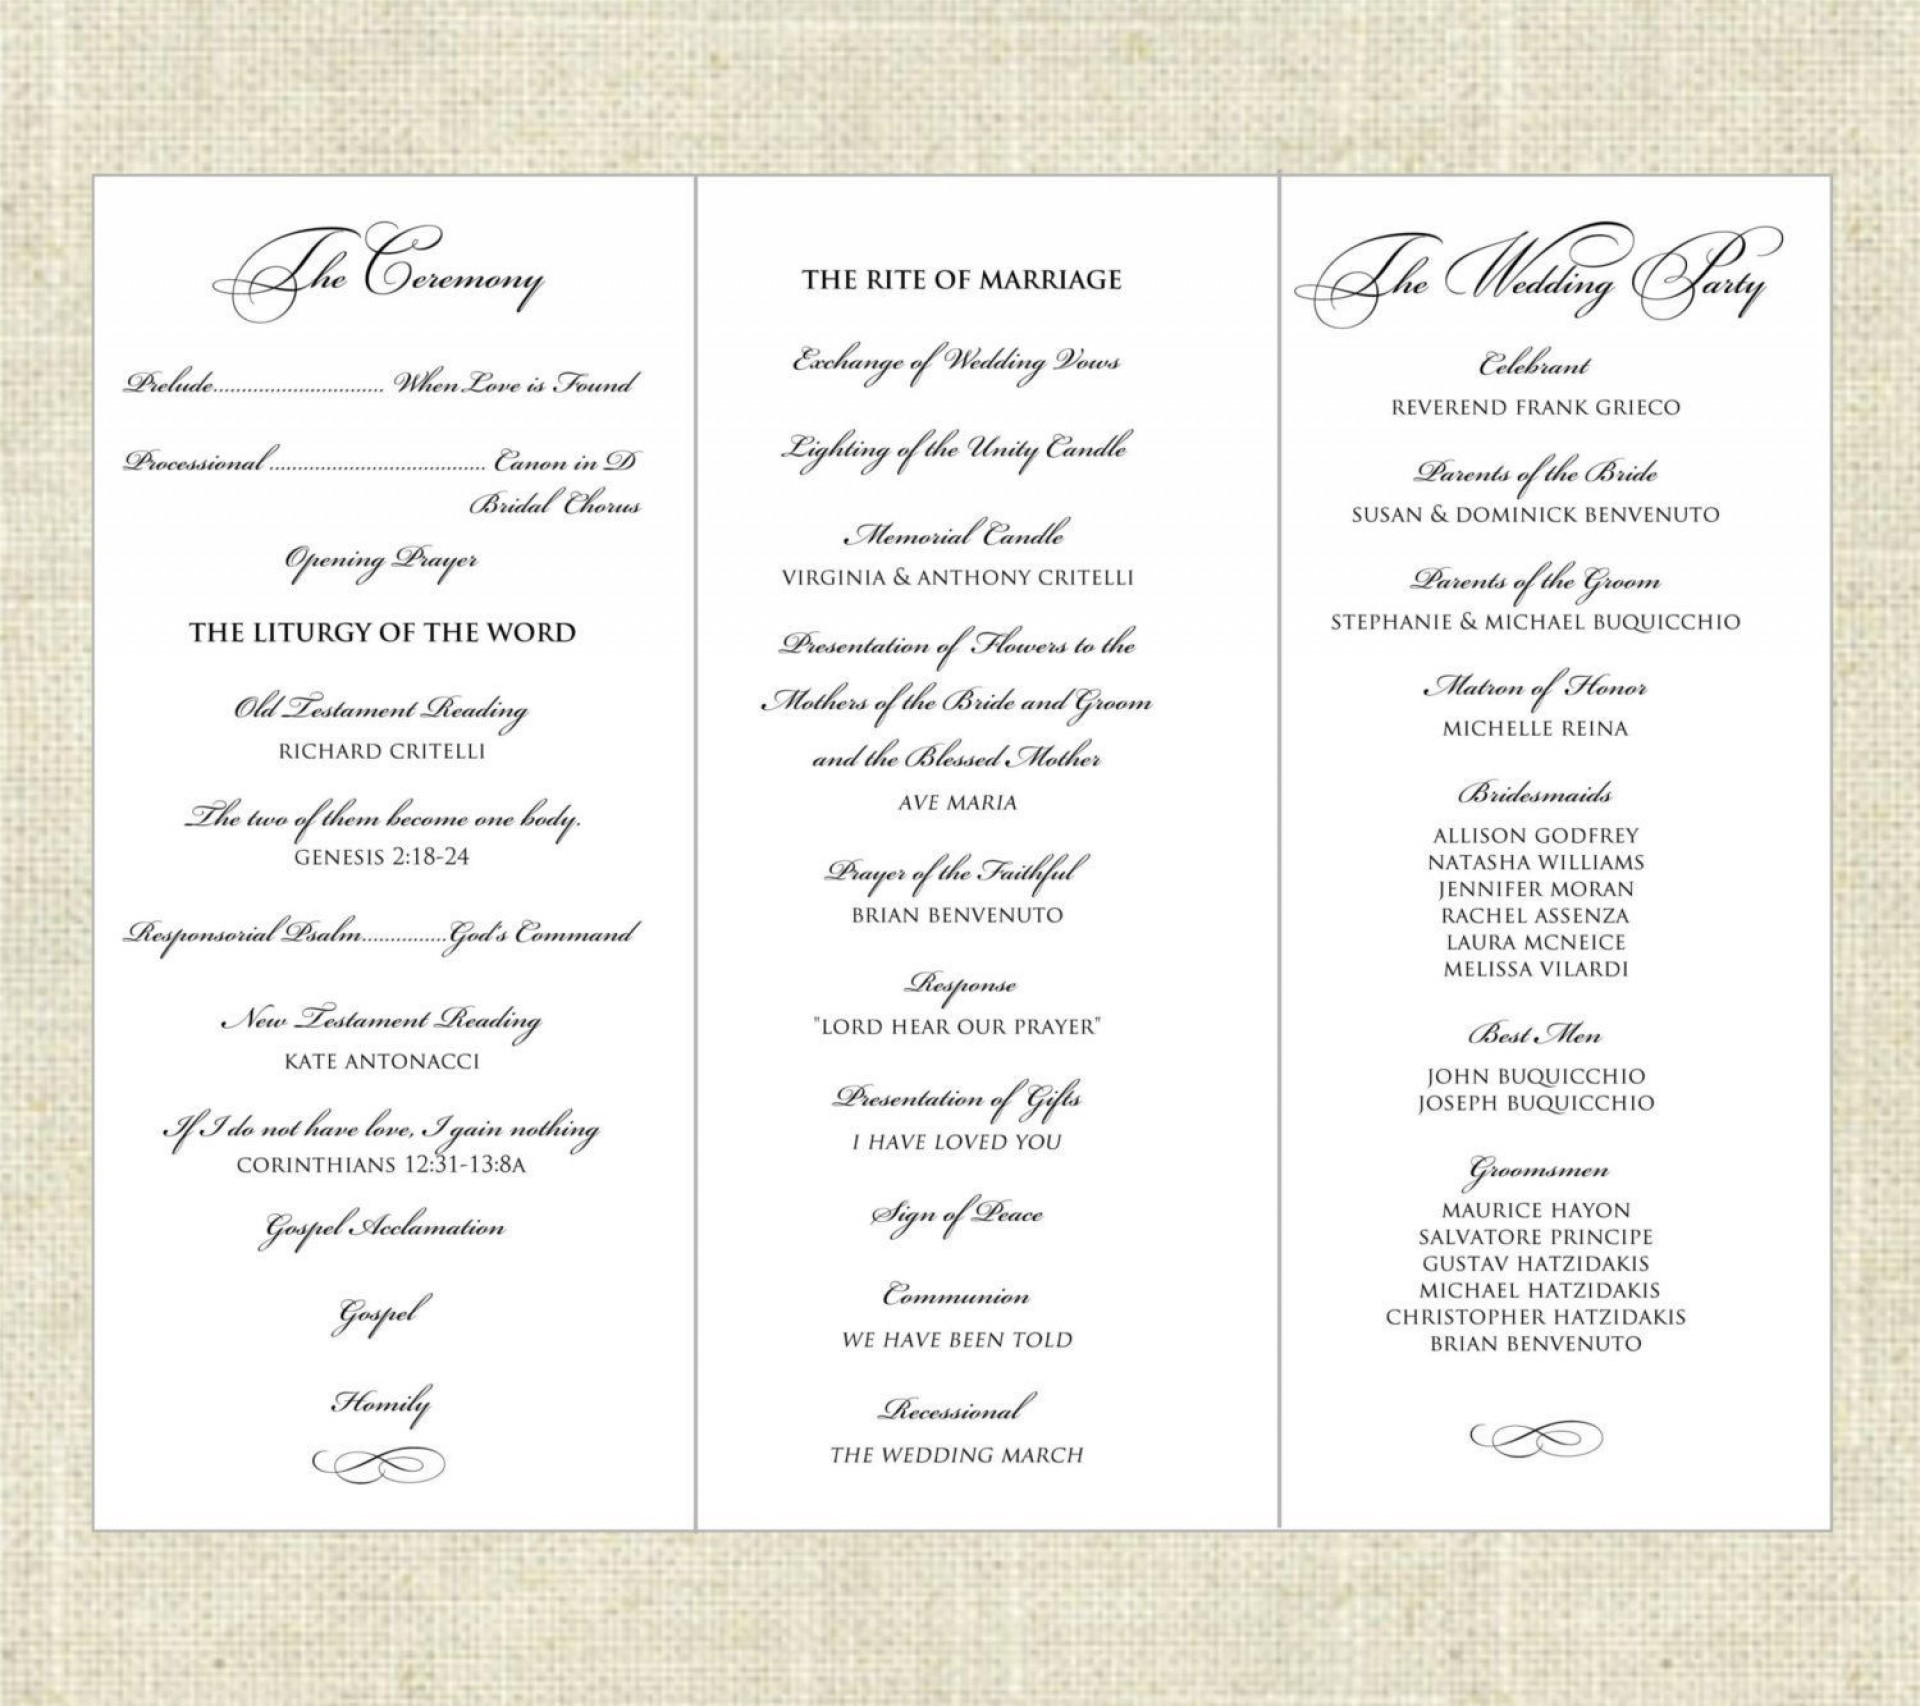 003 Imposing Wedding Program Template Word Sample  Catholic Mas Wording Idea Example Simple1920